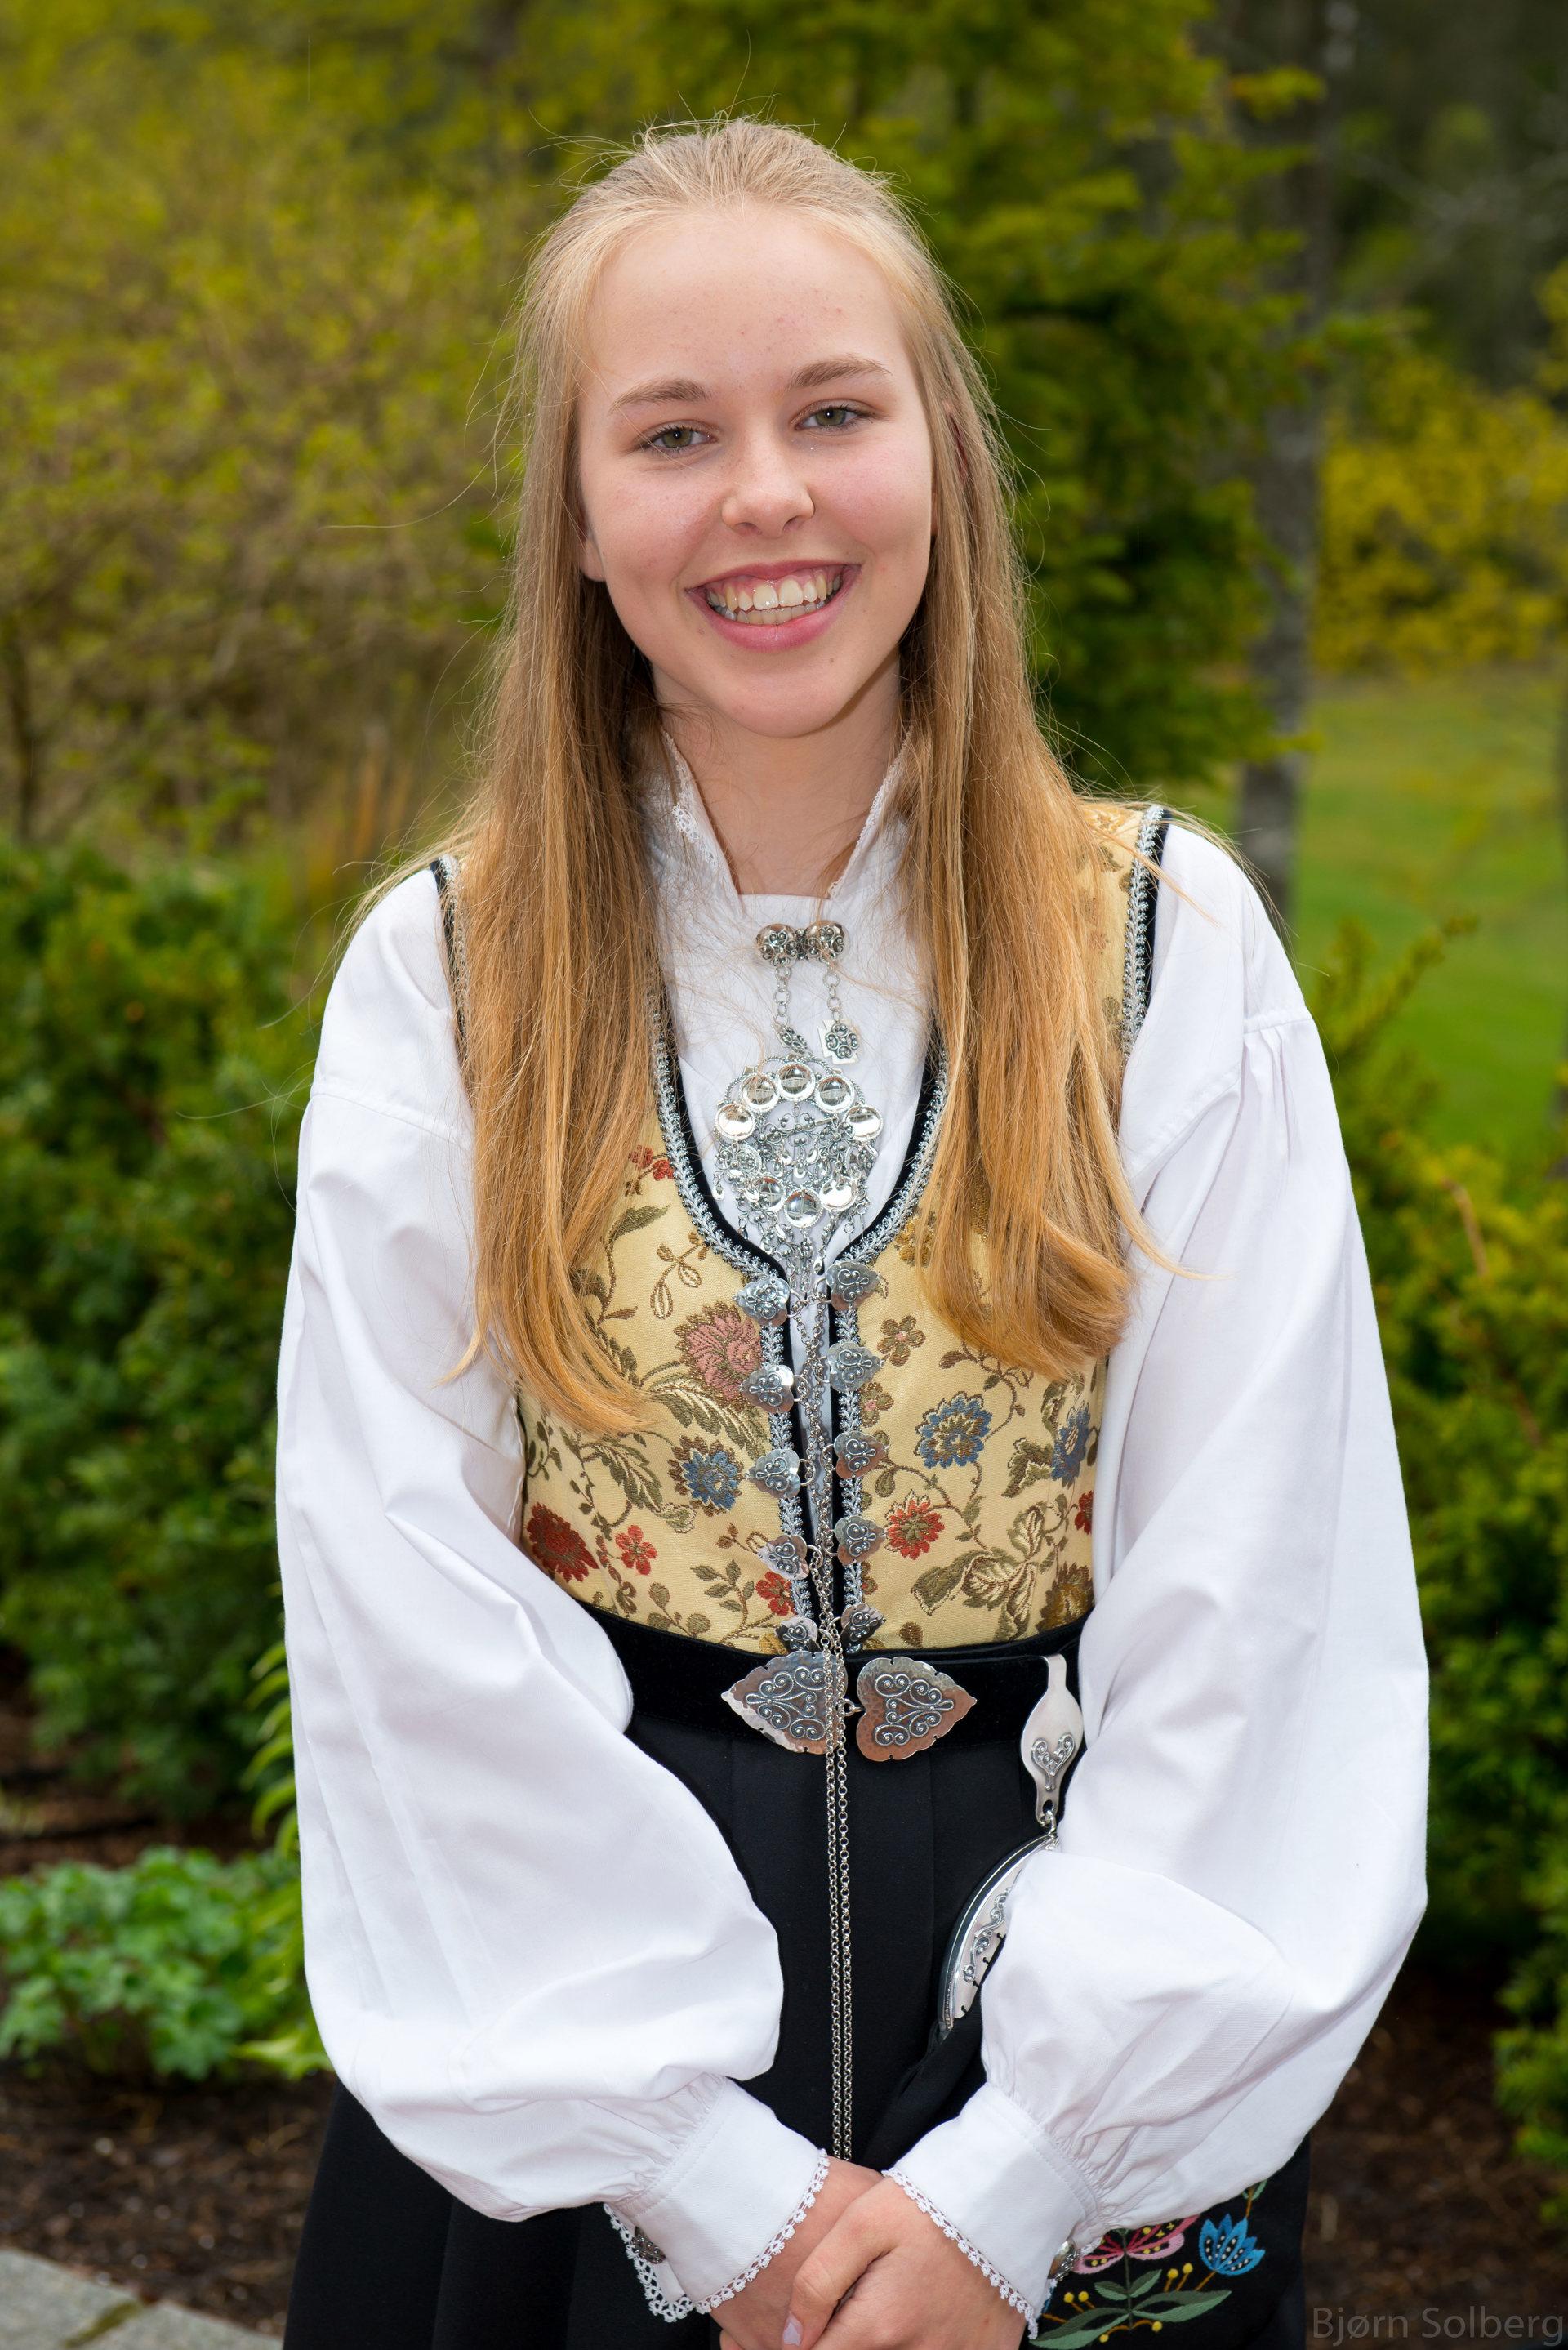 20140511-HSMK, konfirmant Kristina, Losby 2014-05-